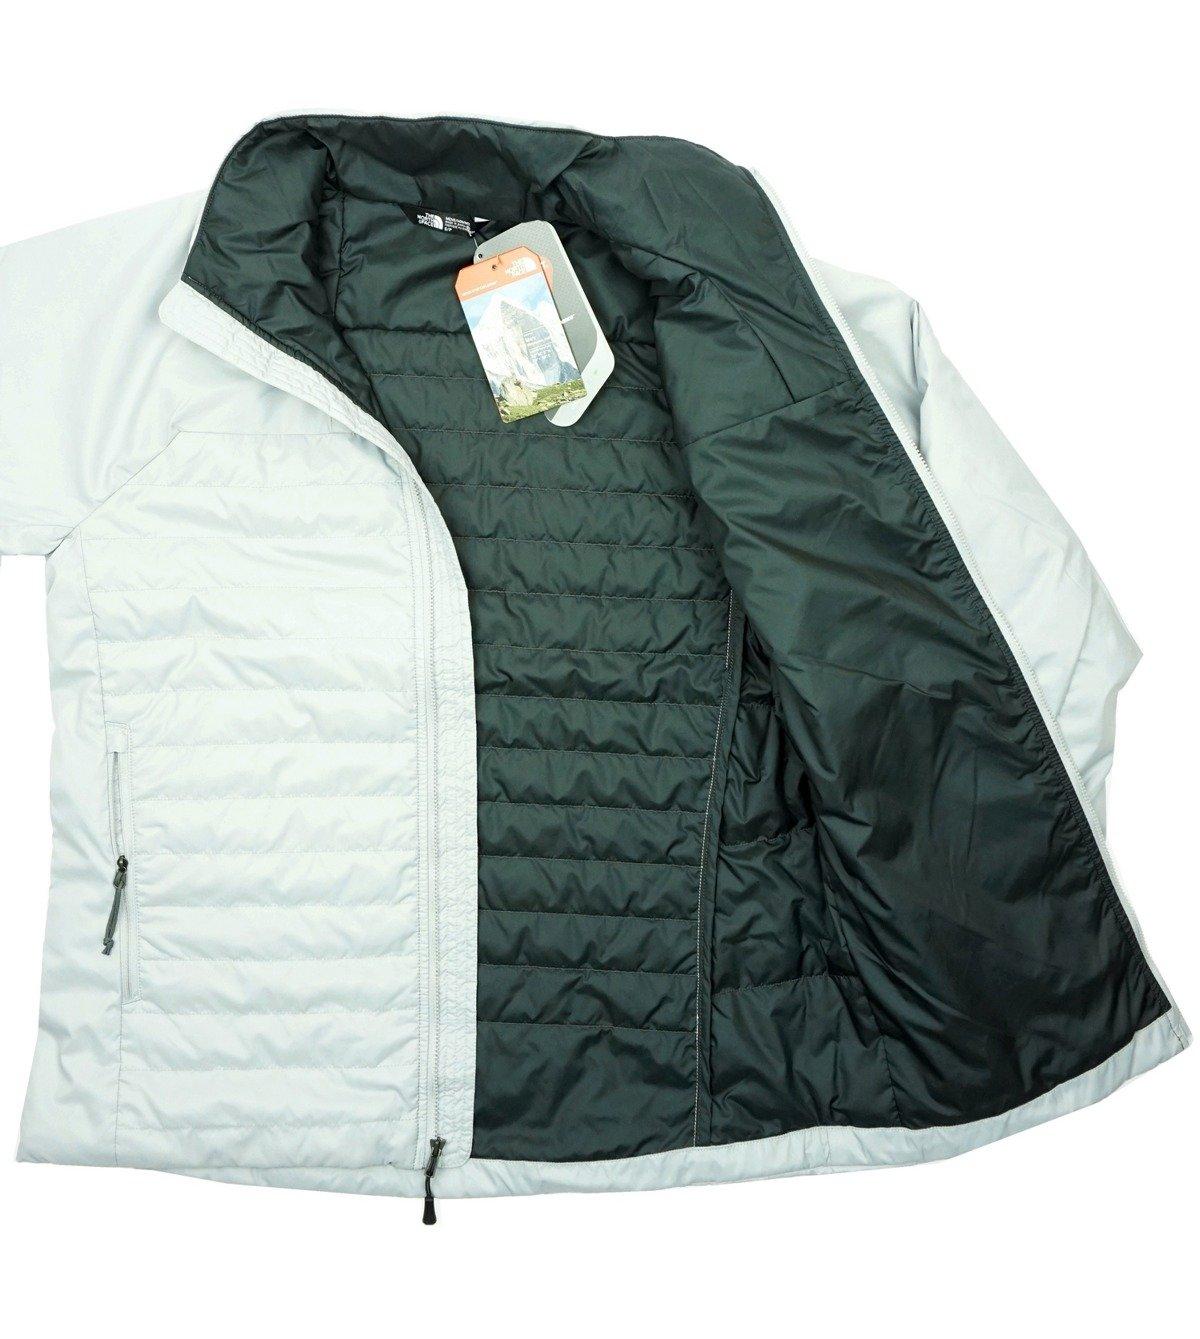 THE NORTH FACE Herren Men Outdoor Jacke Jacket Grau Grey Atmungsaktiv